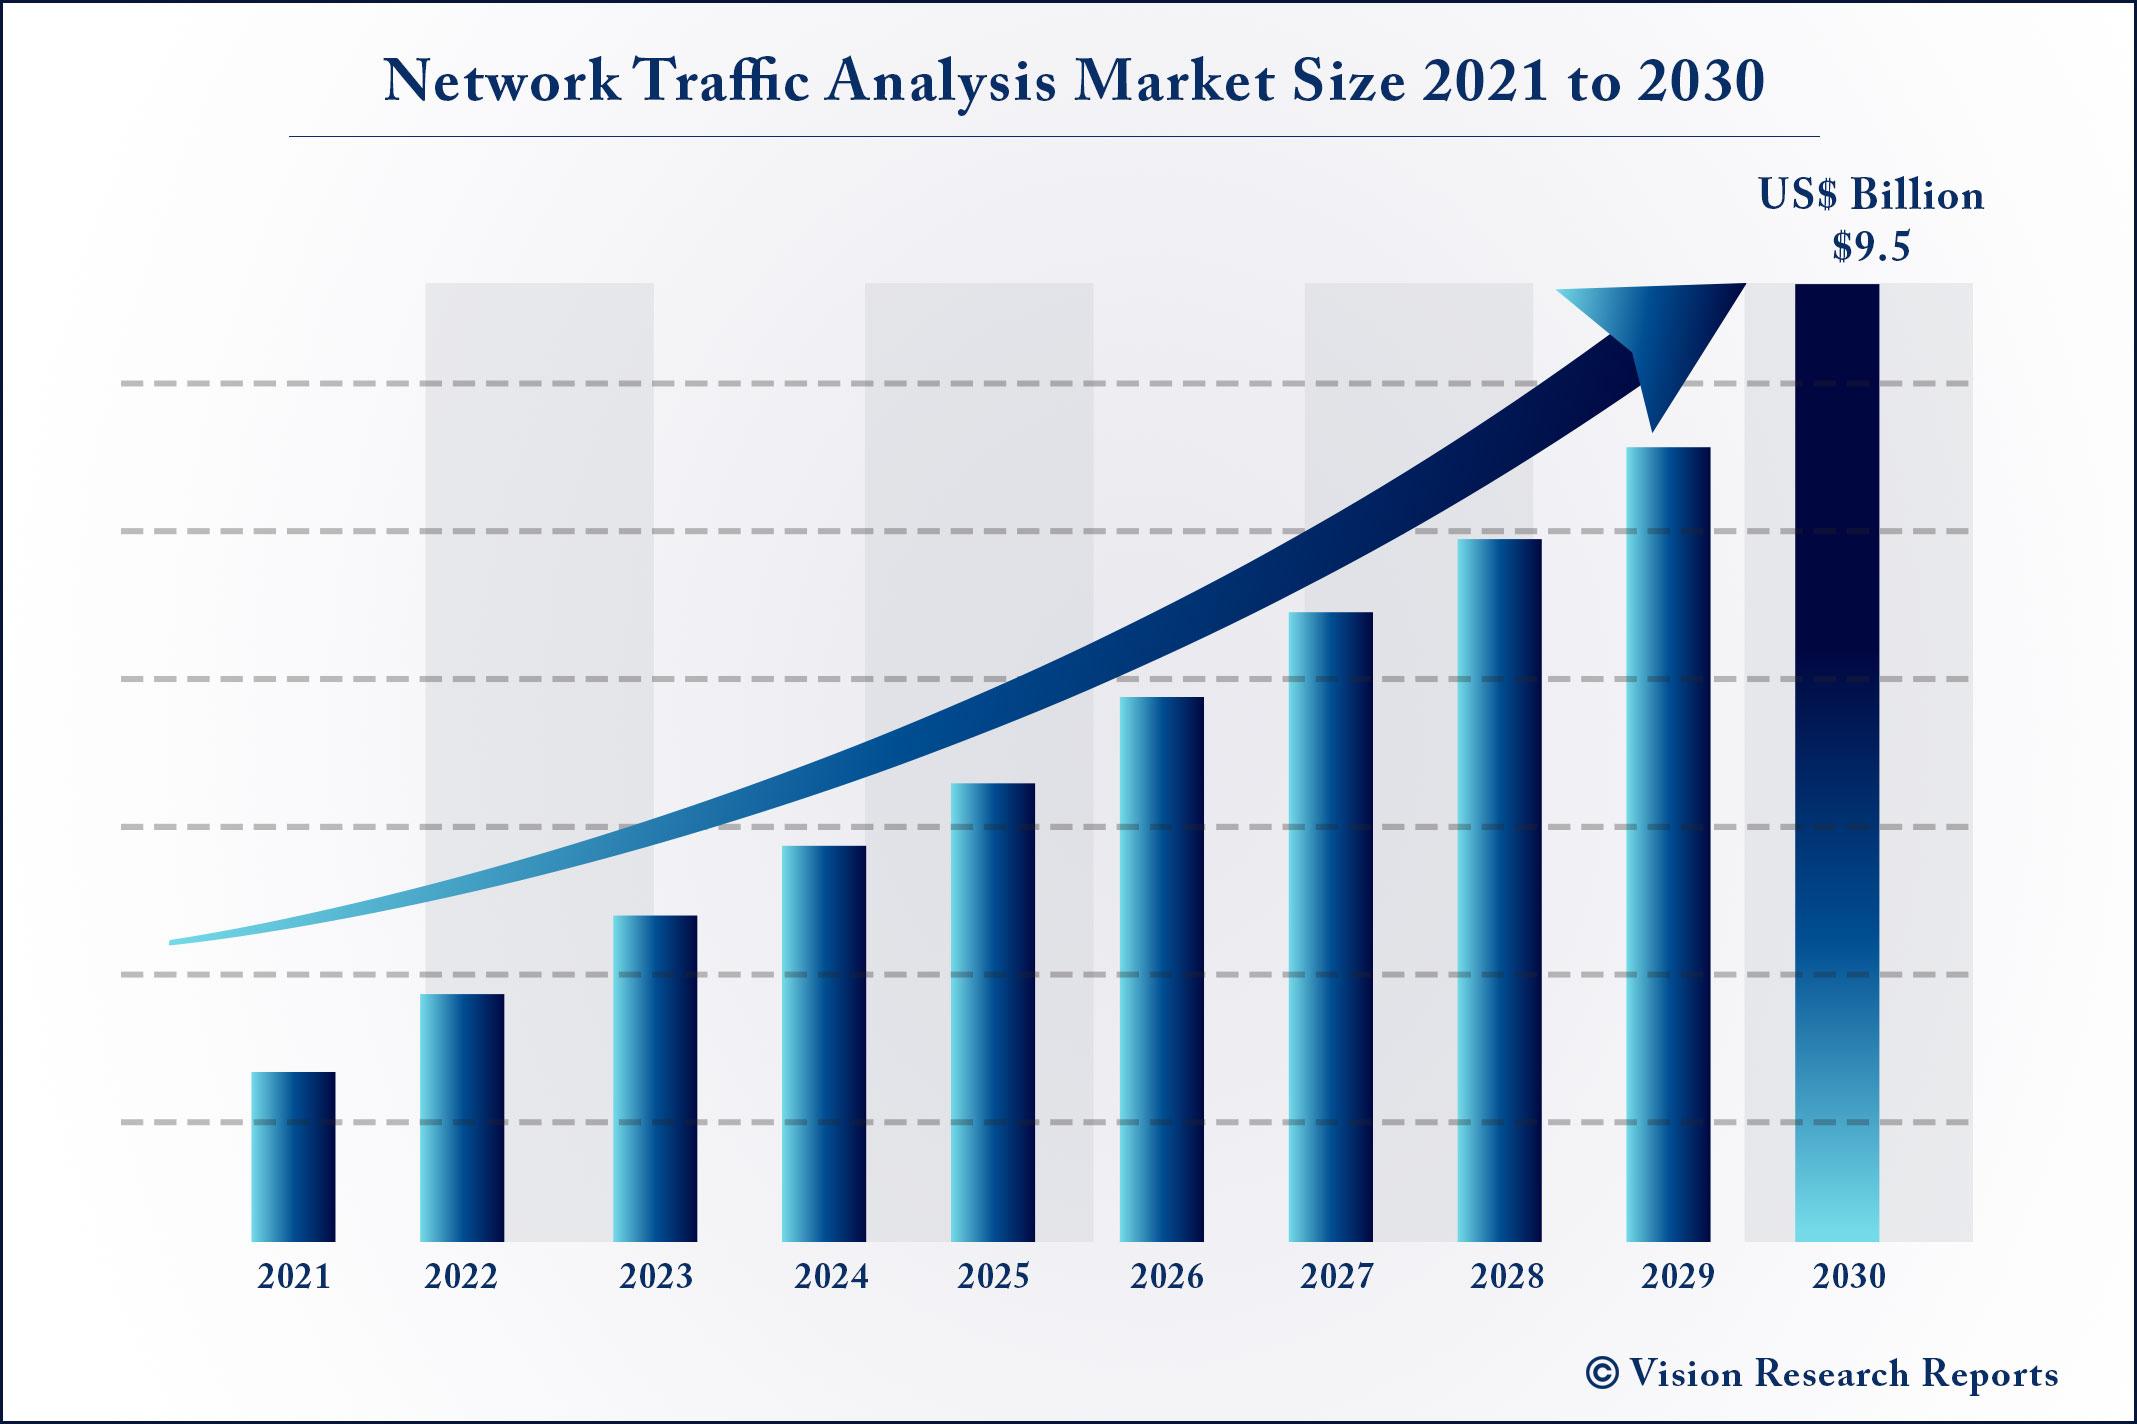 Network Traffic Analysis Market Size 2021 to 2030